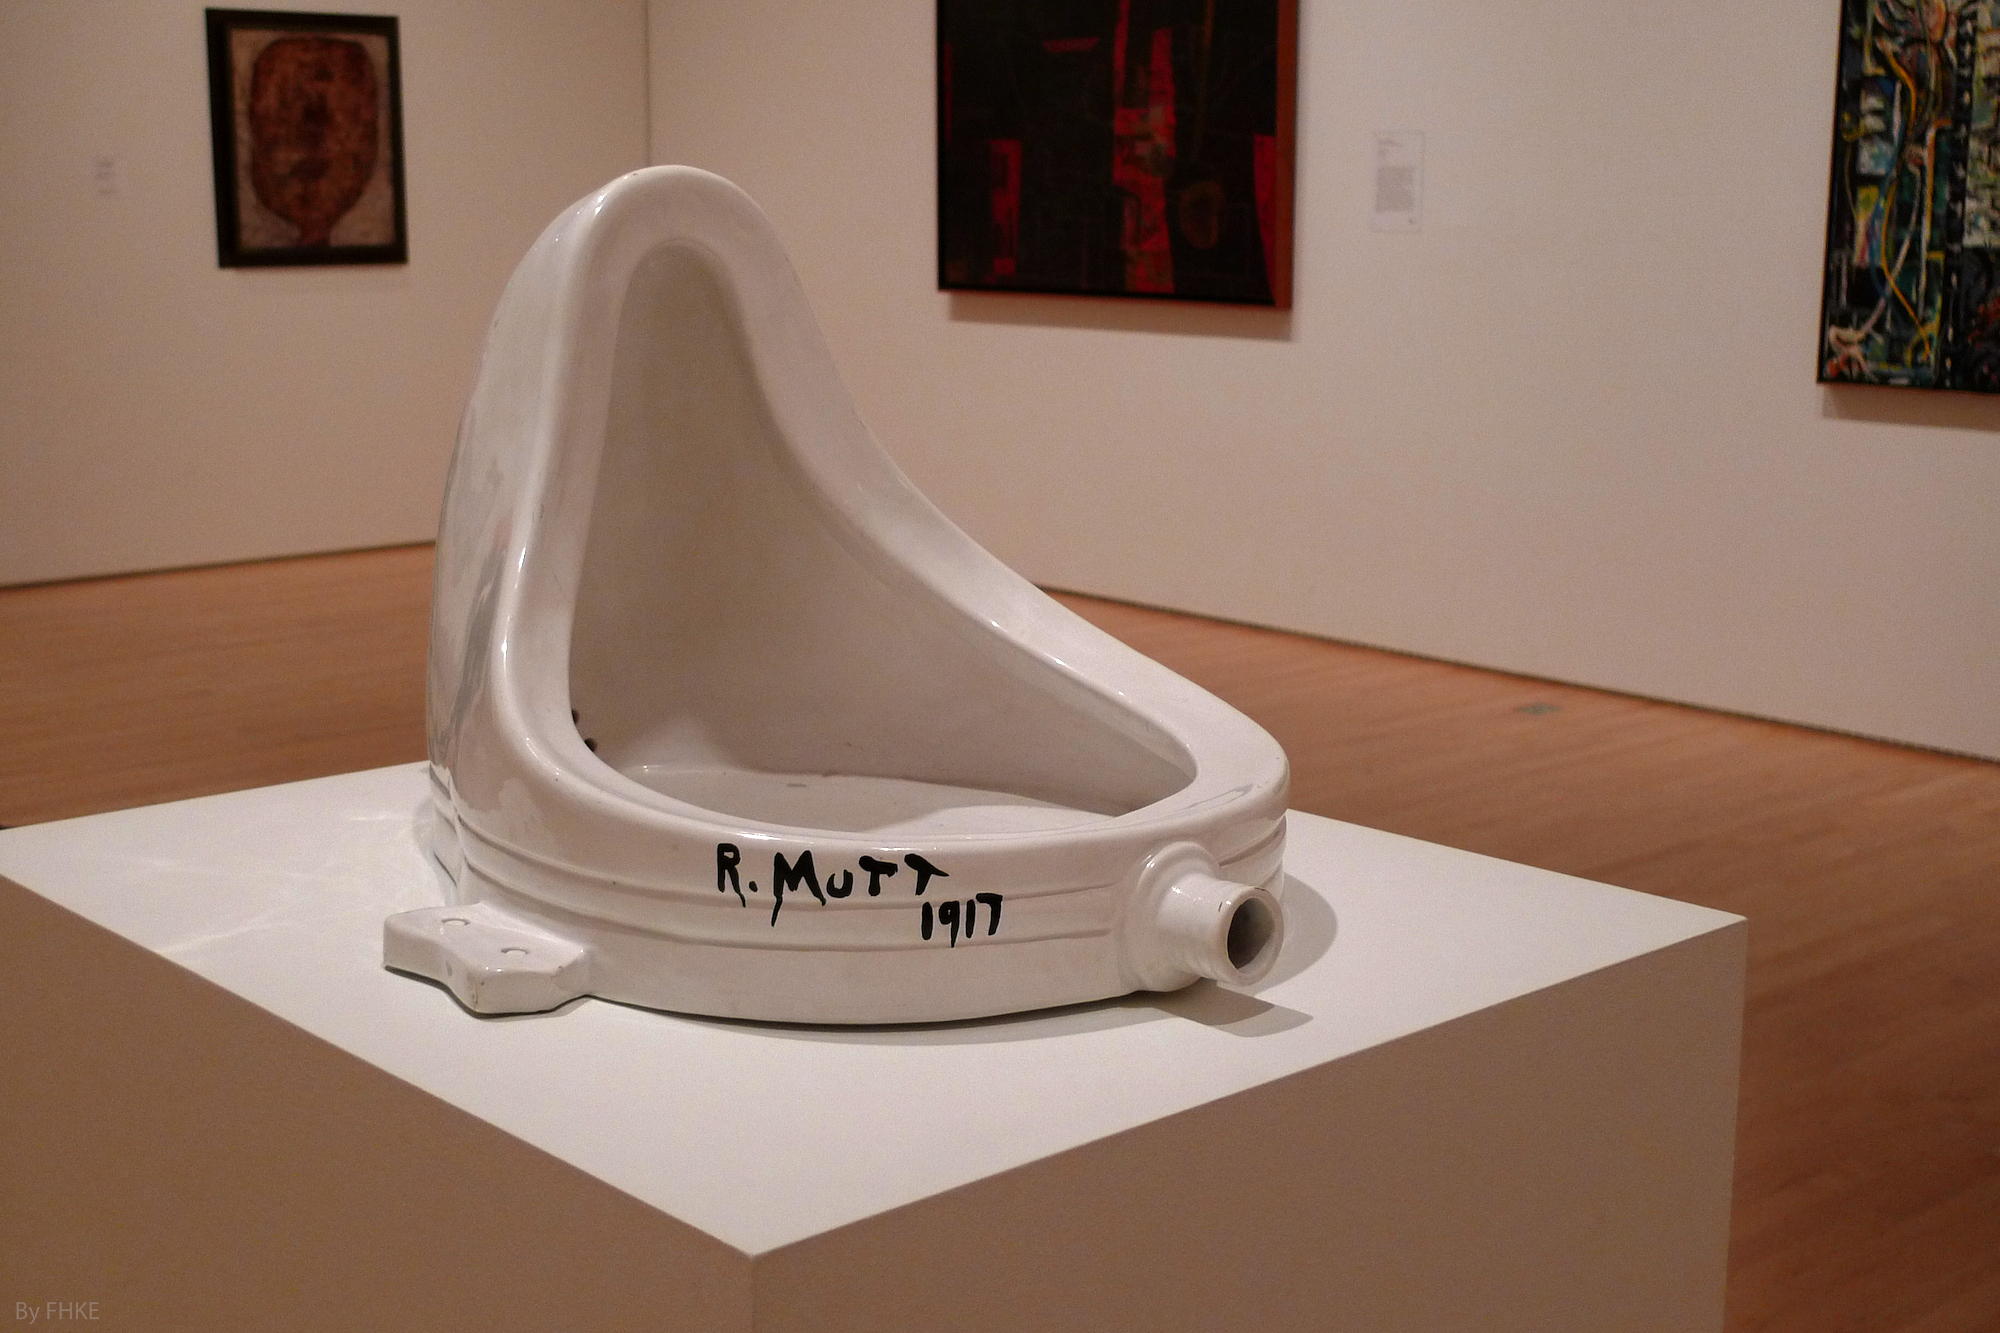 San_Francisco_Museum_of_Modern_Art_(3023815215)